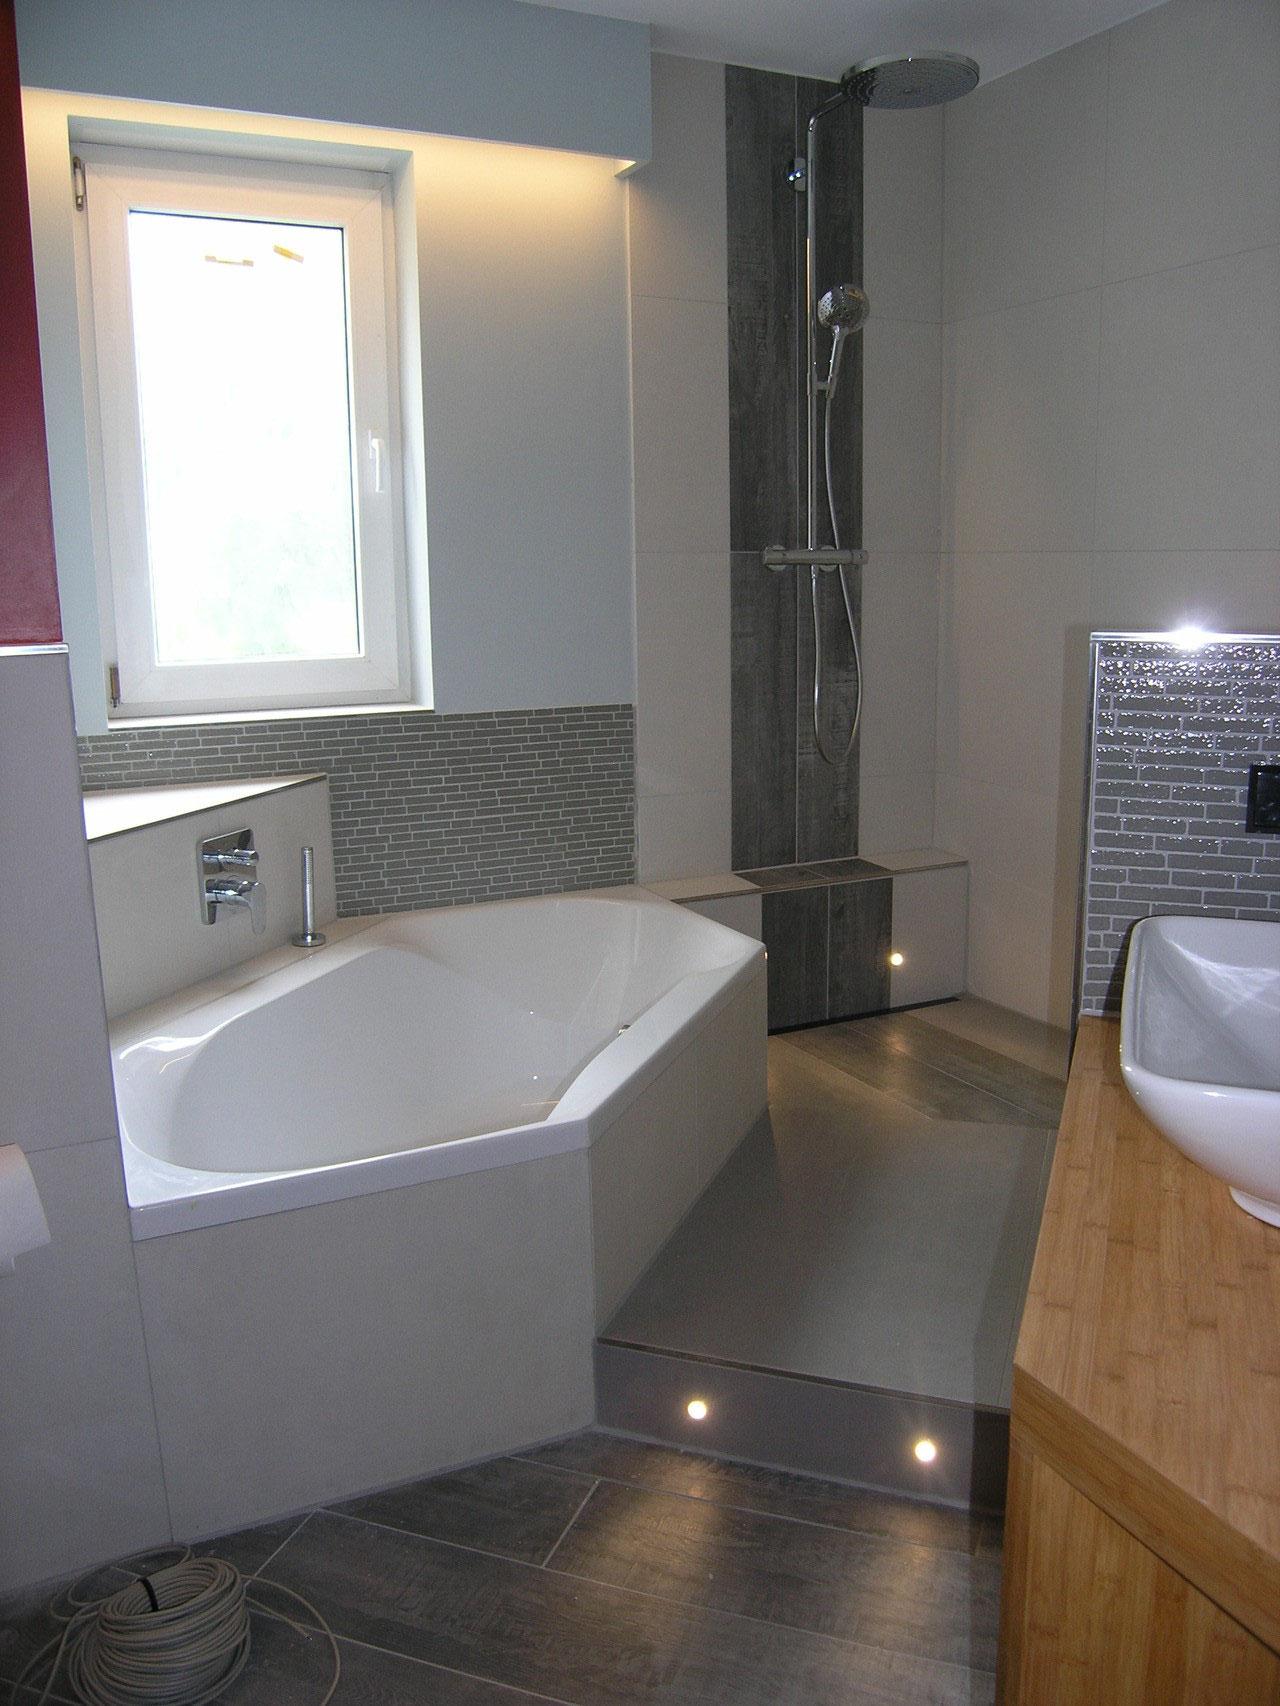 Gastherme Badezimmer | Dachausbau Echt Zwinz